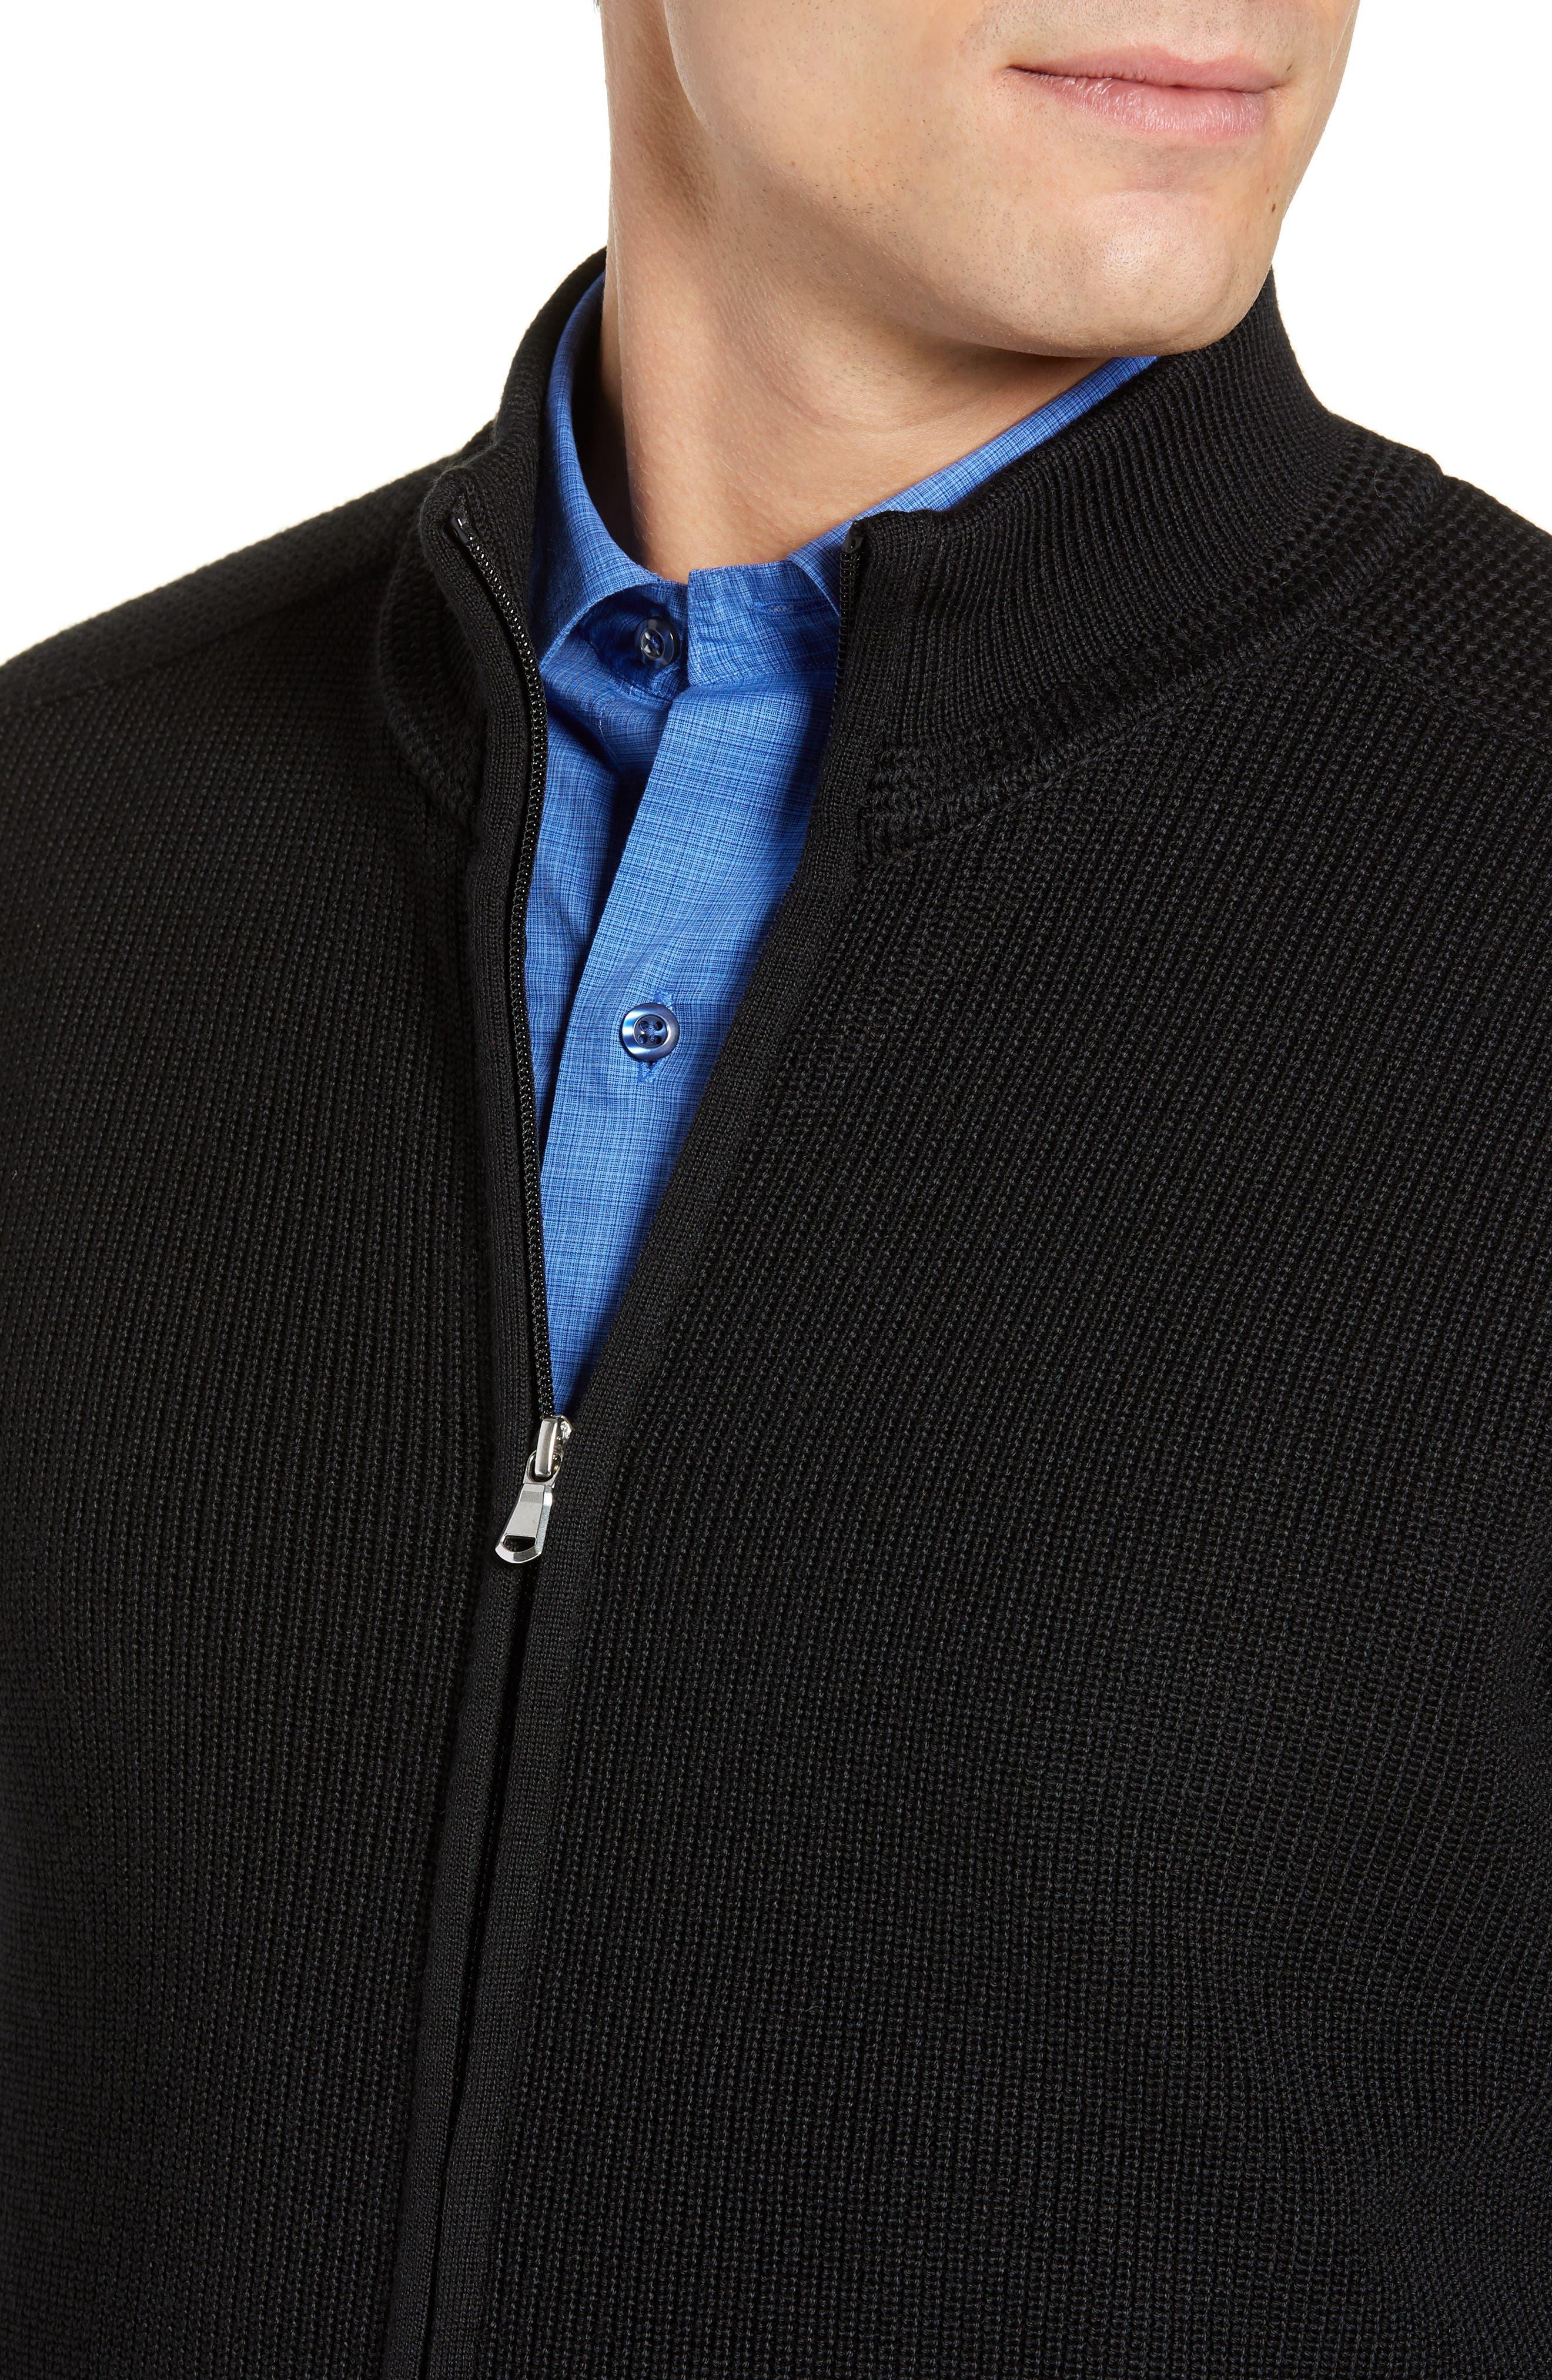 Water Resistant Merino Wool Blend Sweater,                             Alternate thumbnail 4, color,                             BLACK